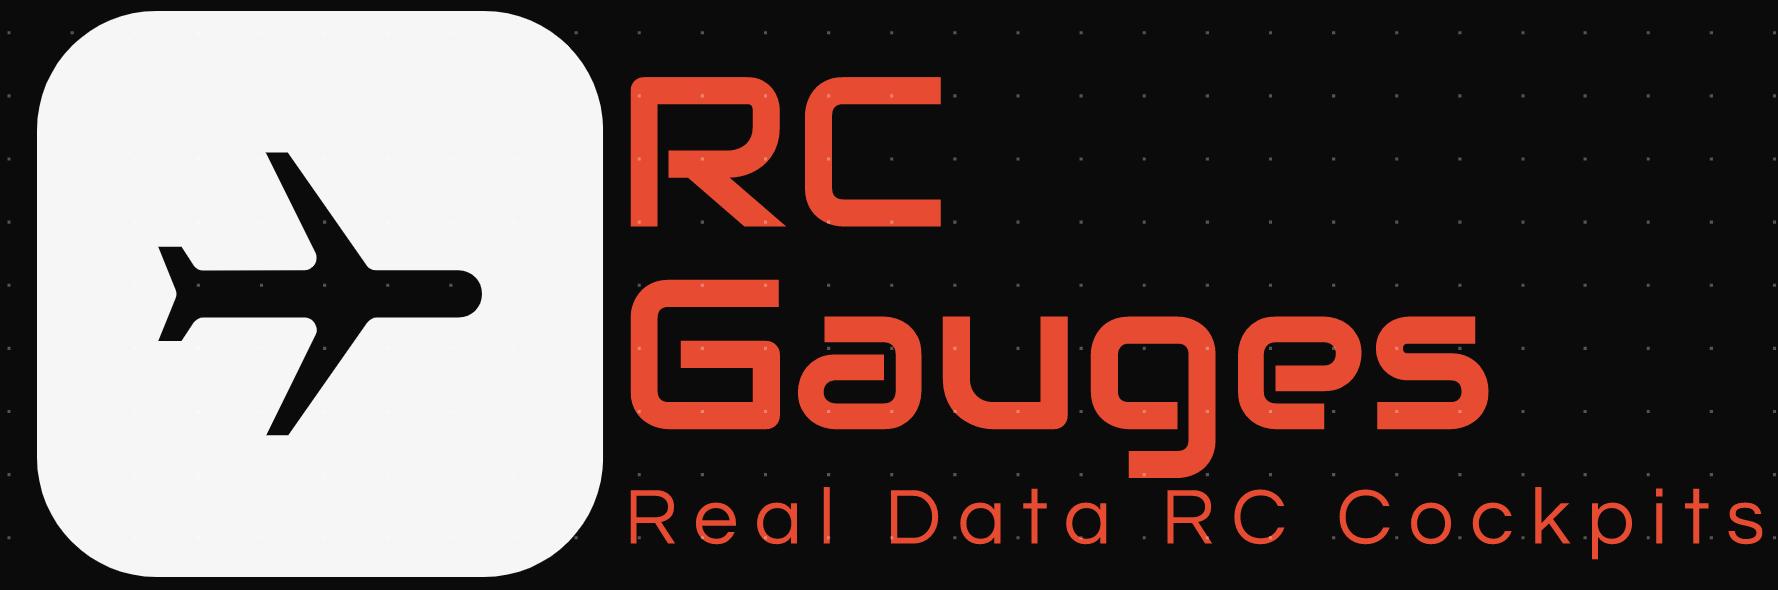 RC GAUGES